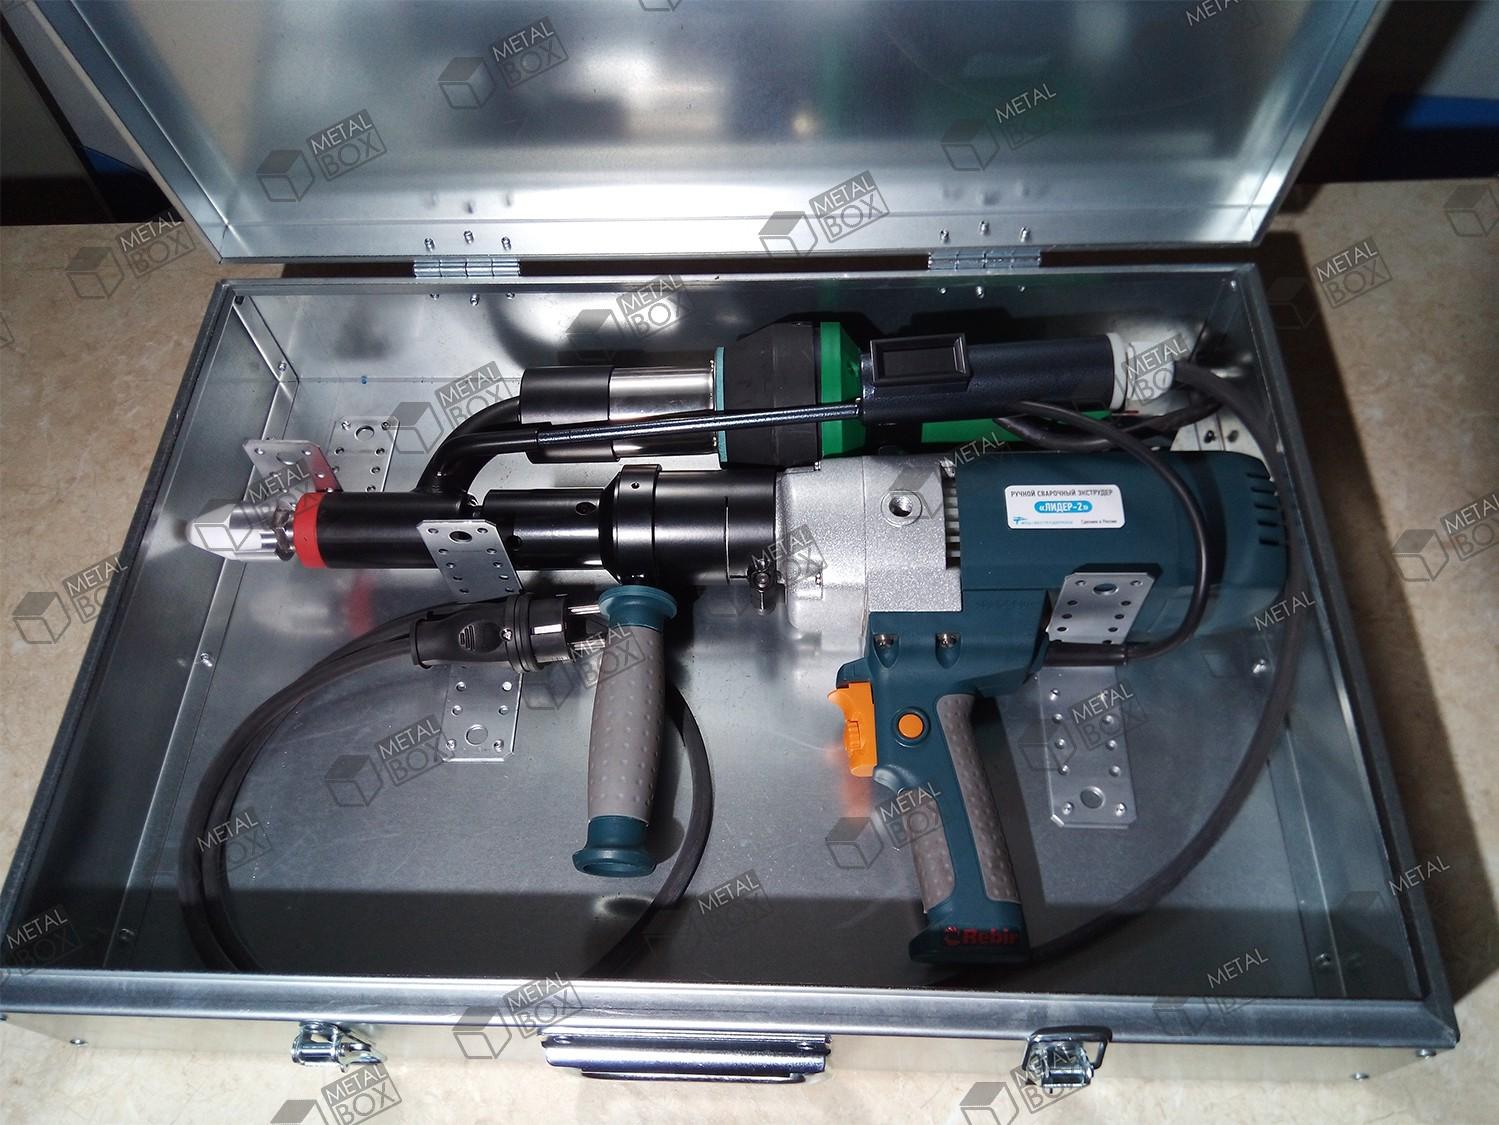 https://bv-case.ru/images/upload/ящики-алюминиевые-520х370х120-мм-для-упаковки-продукции_100.JPG